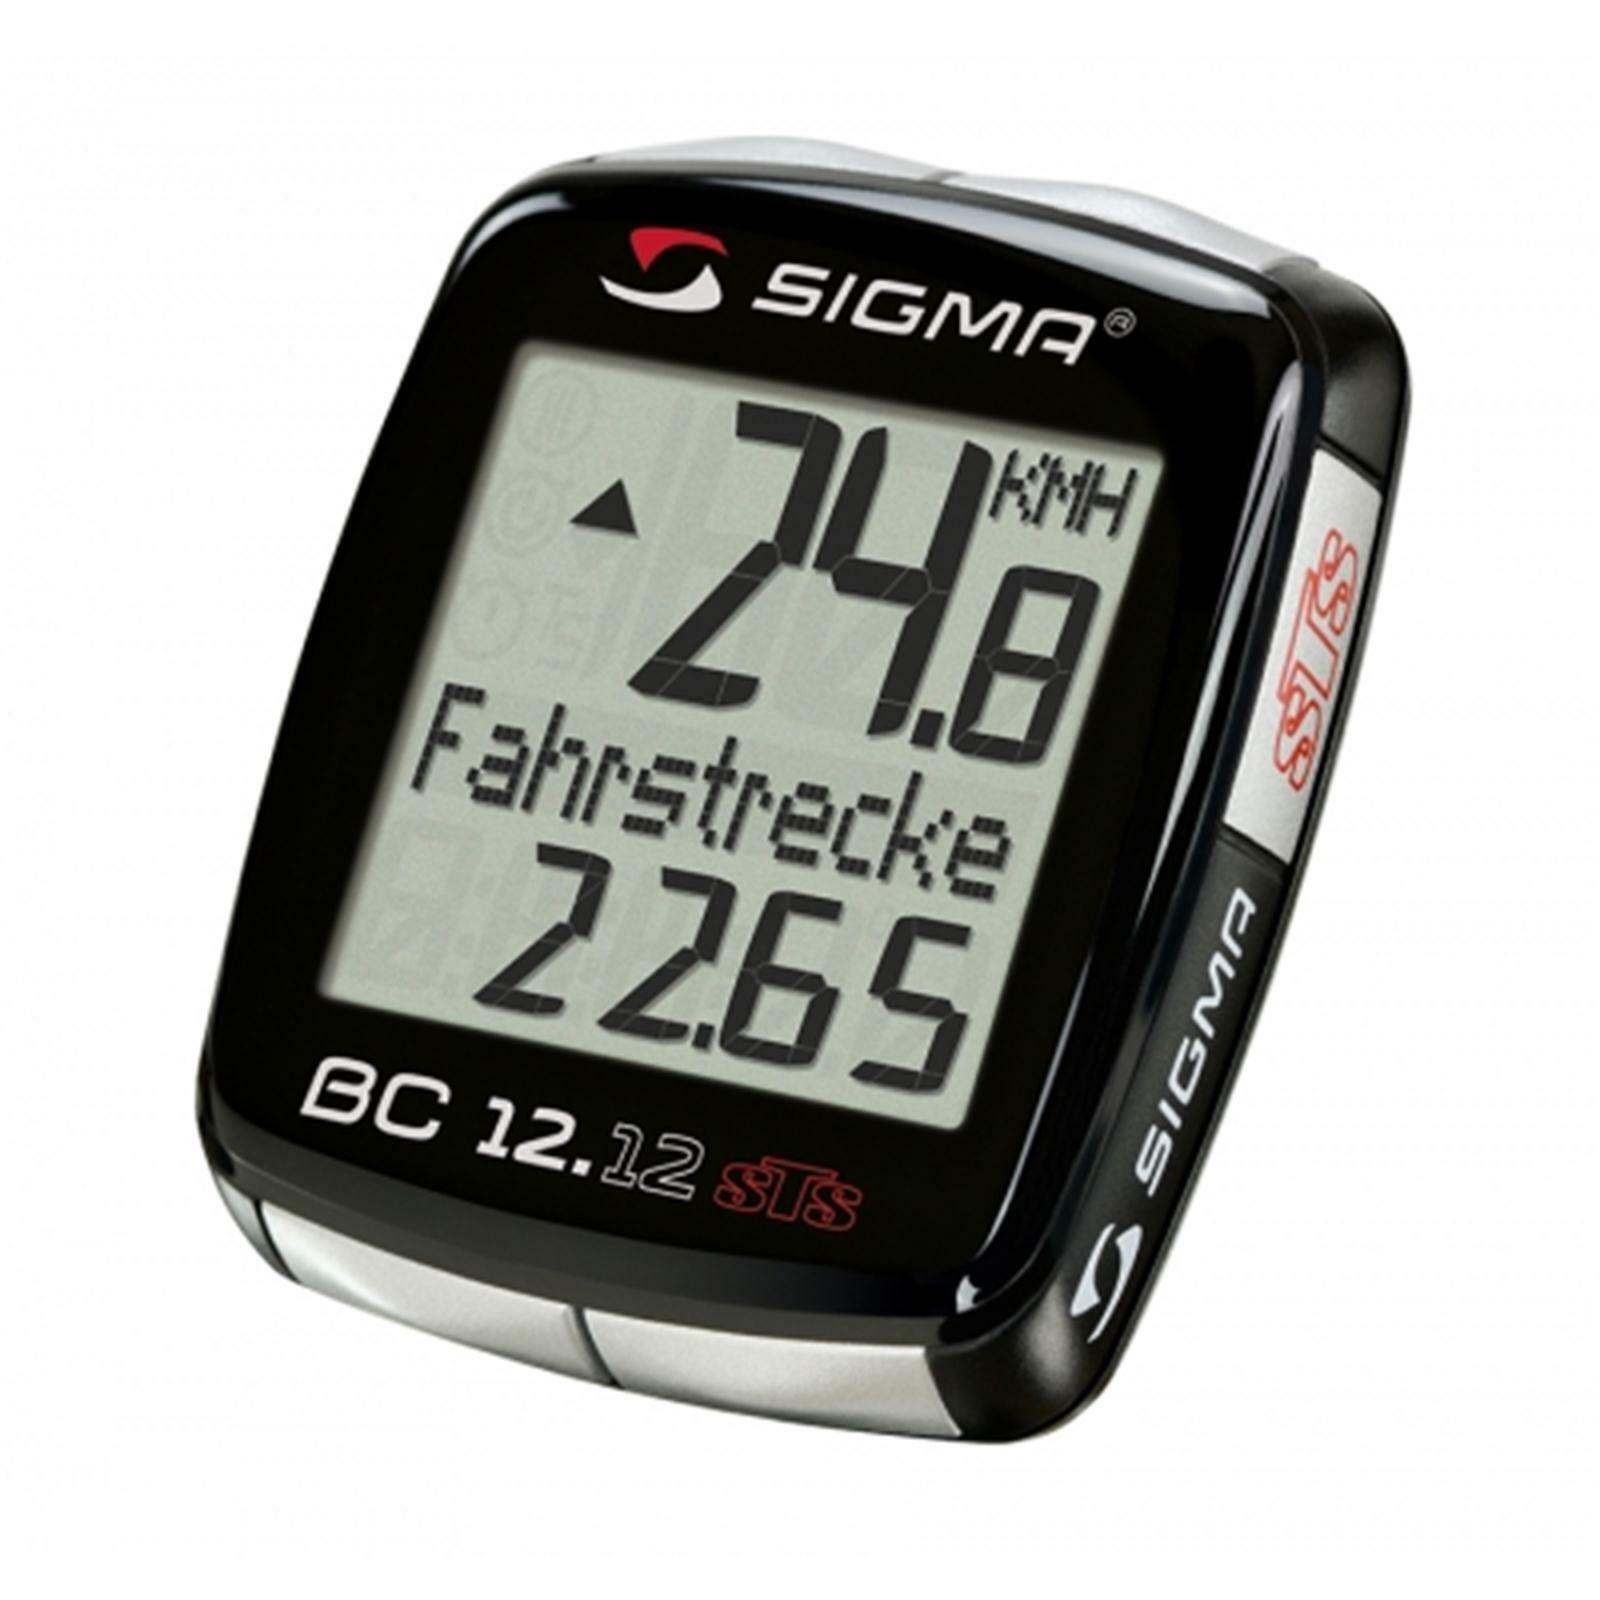 Sigma Sport Topline radcomputer bc 12.12 STS inalámbrico bicicleta velocímetro equipo